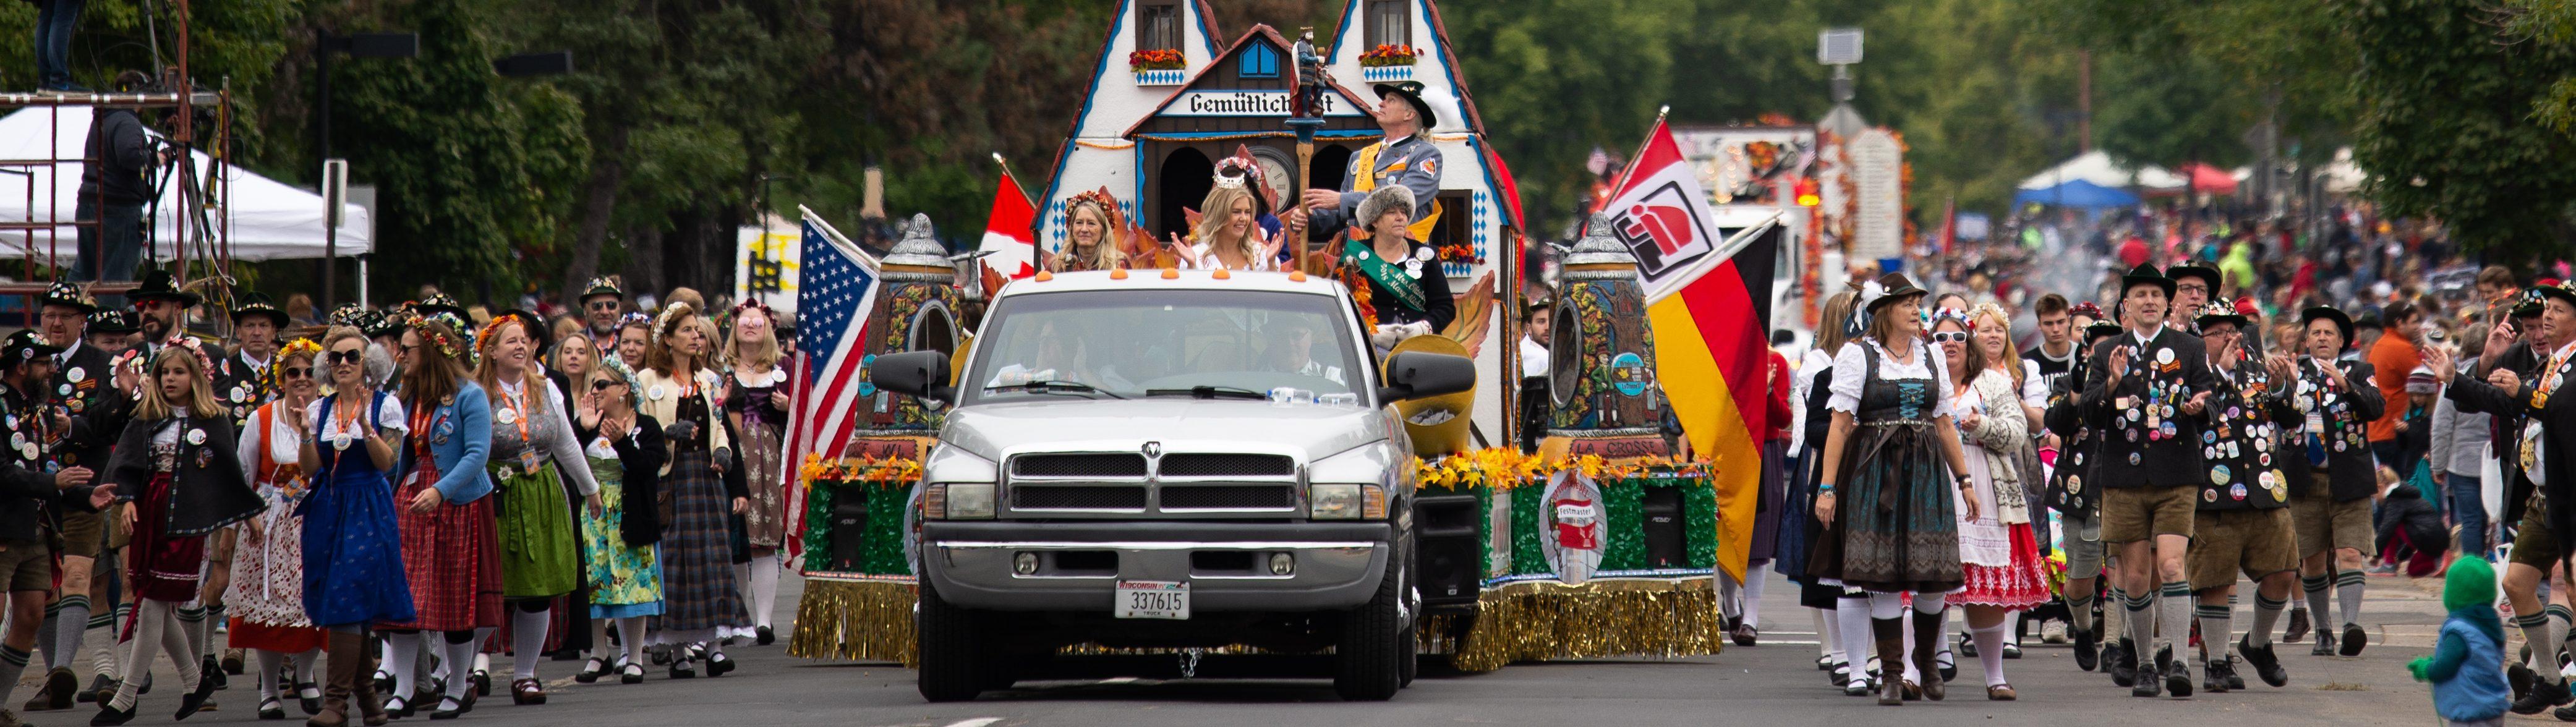 Oktoberfest Maple Leaf Parade Torchlight Parade